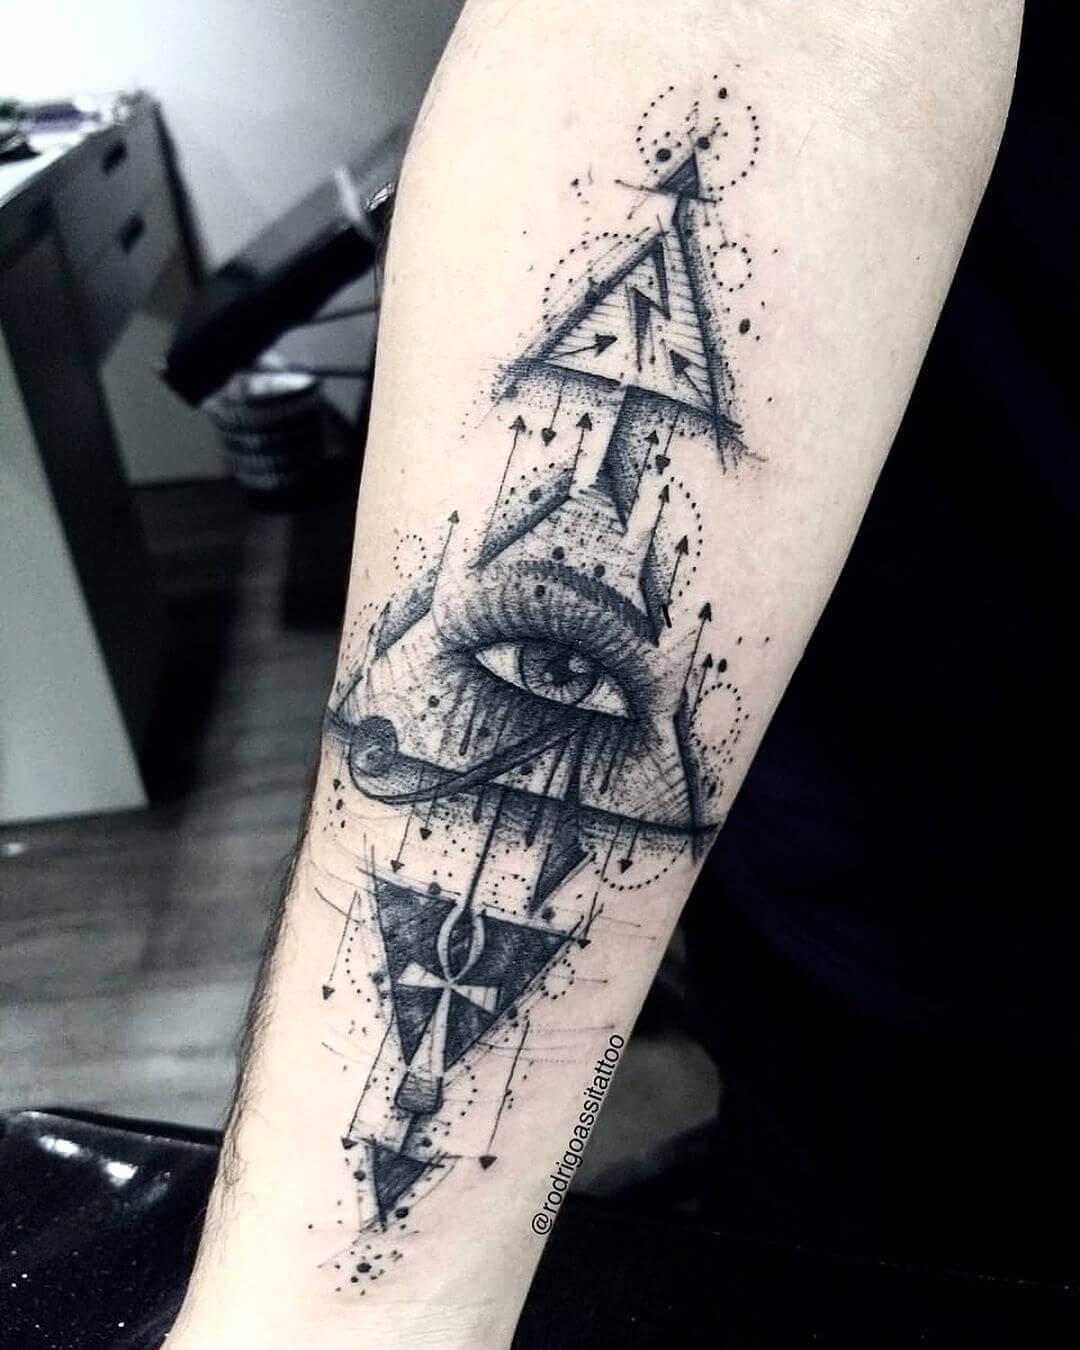 geometric eye of horus tattoo on arm